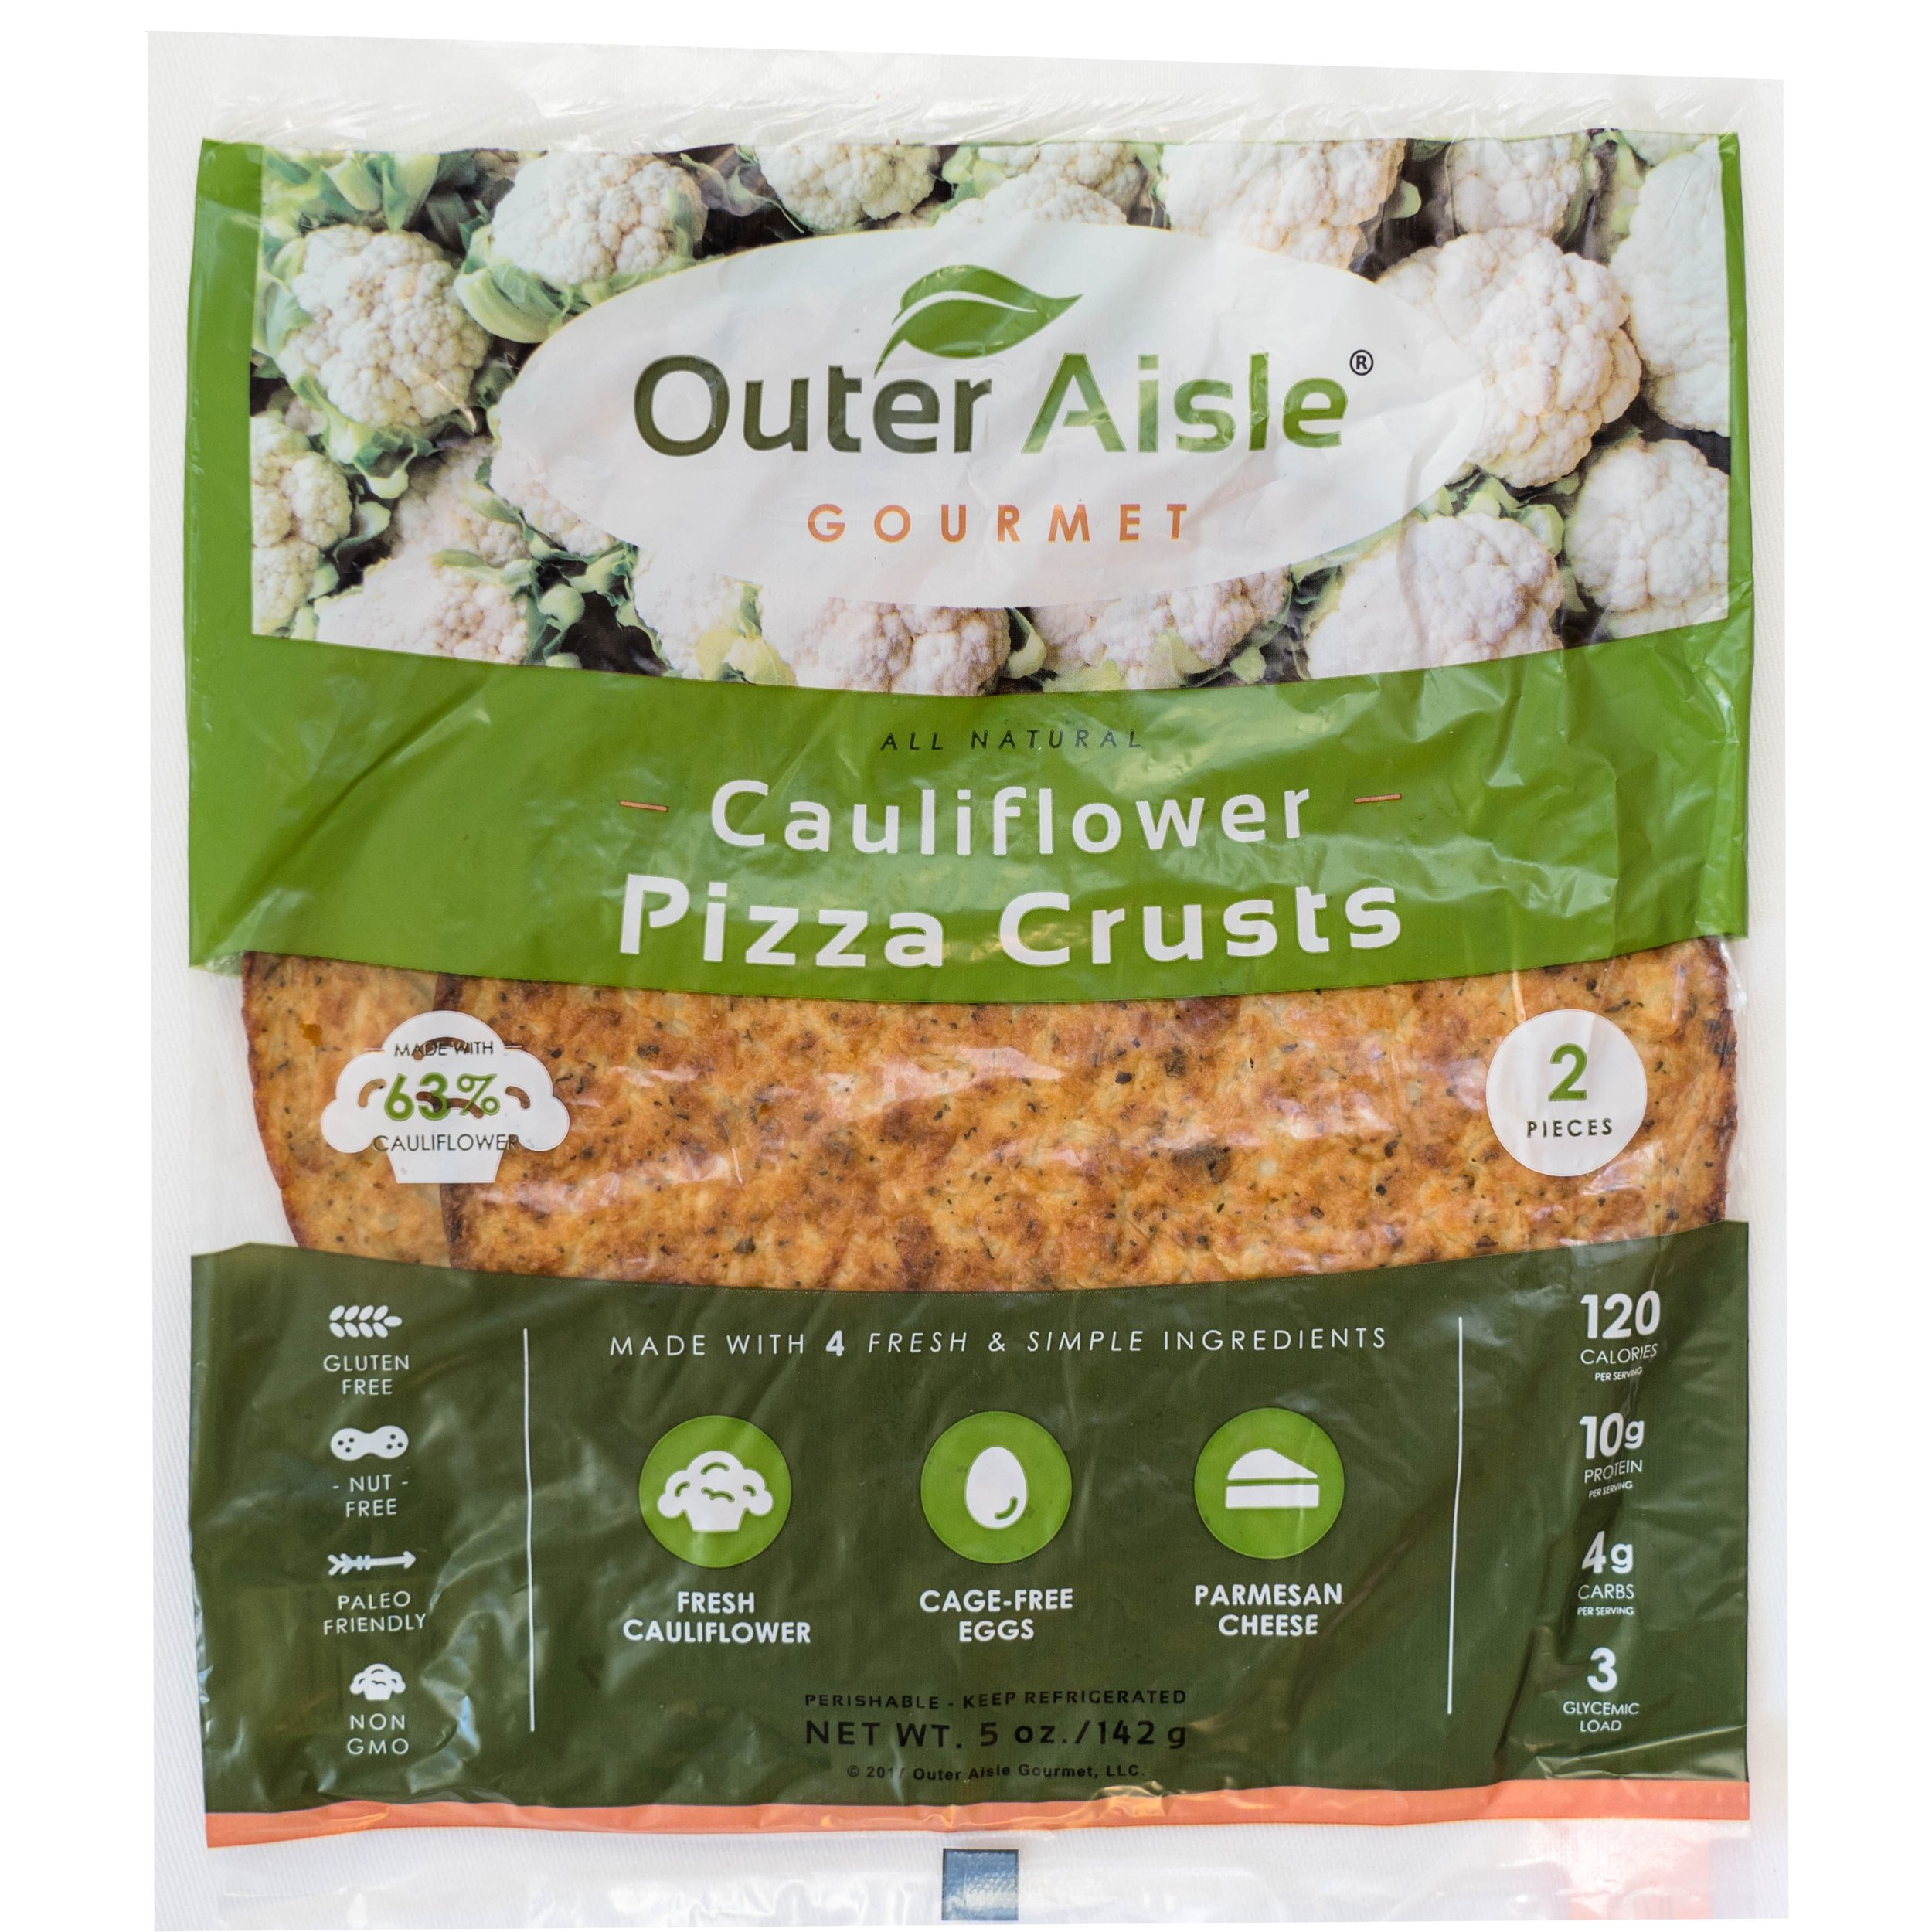 Outer Aisle Gourmet - (24 pieces) Cauliflower Sandwich